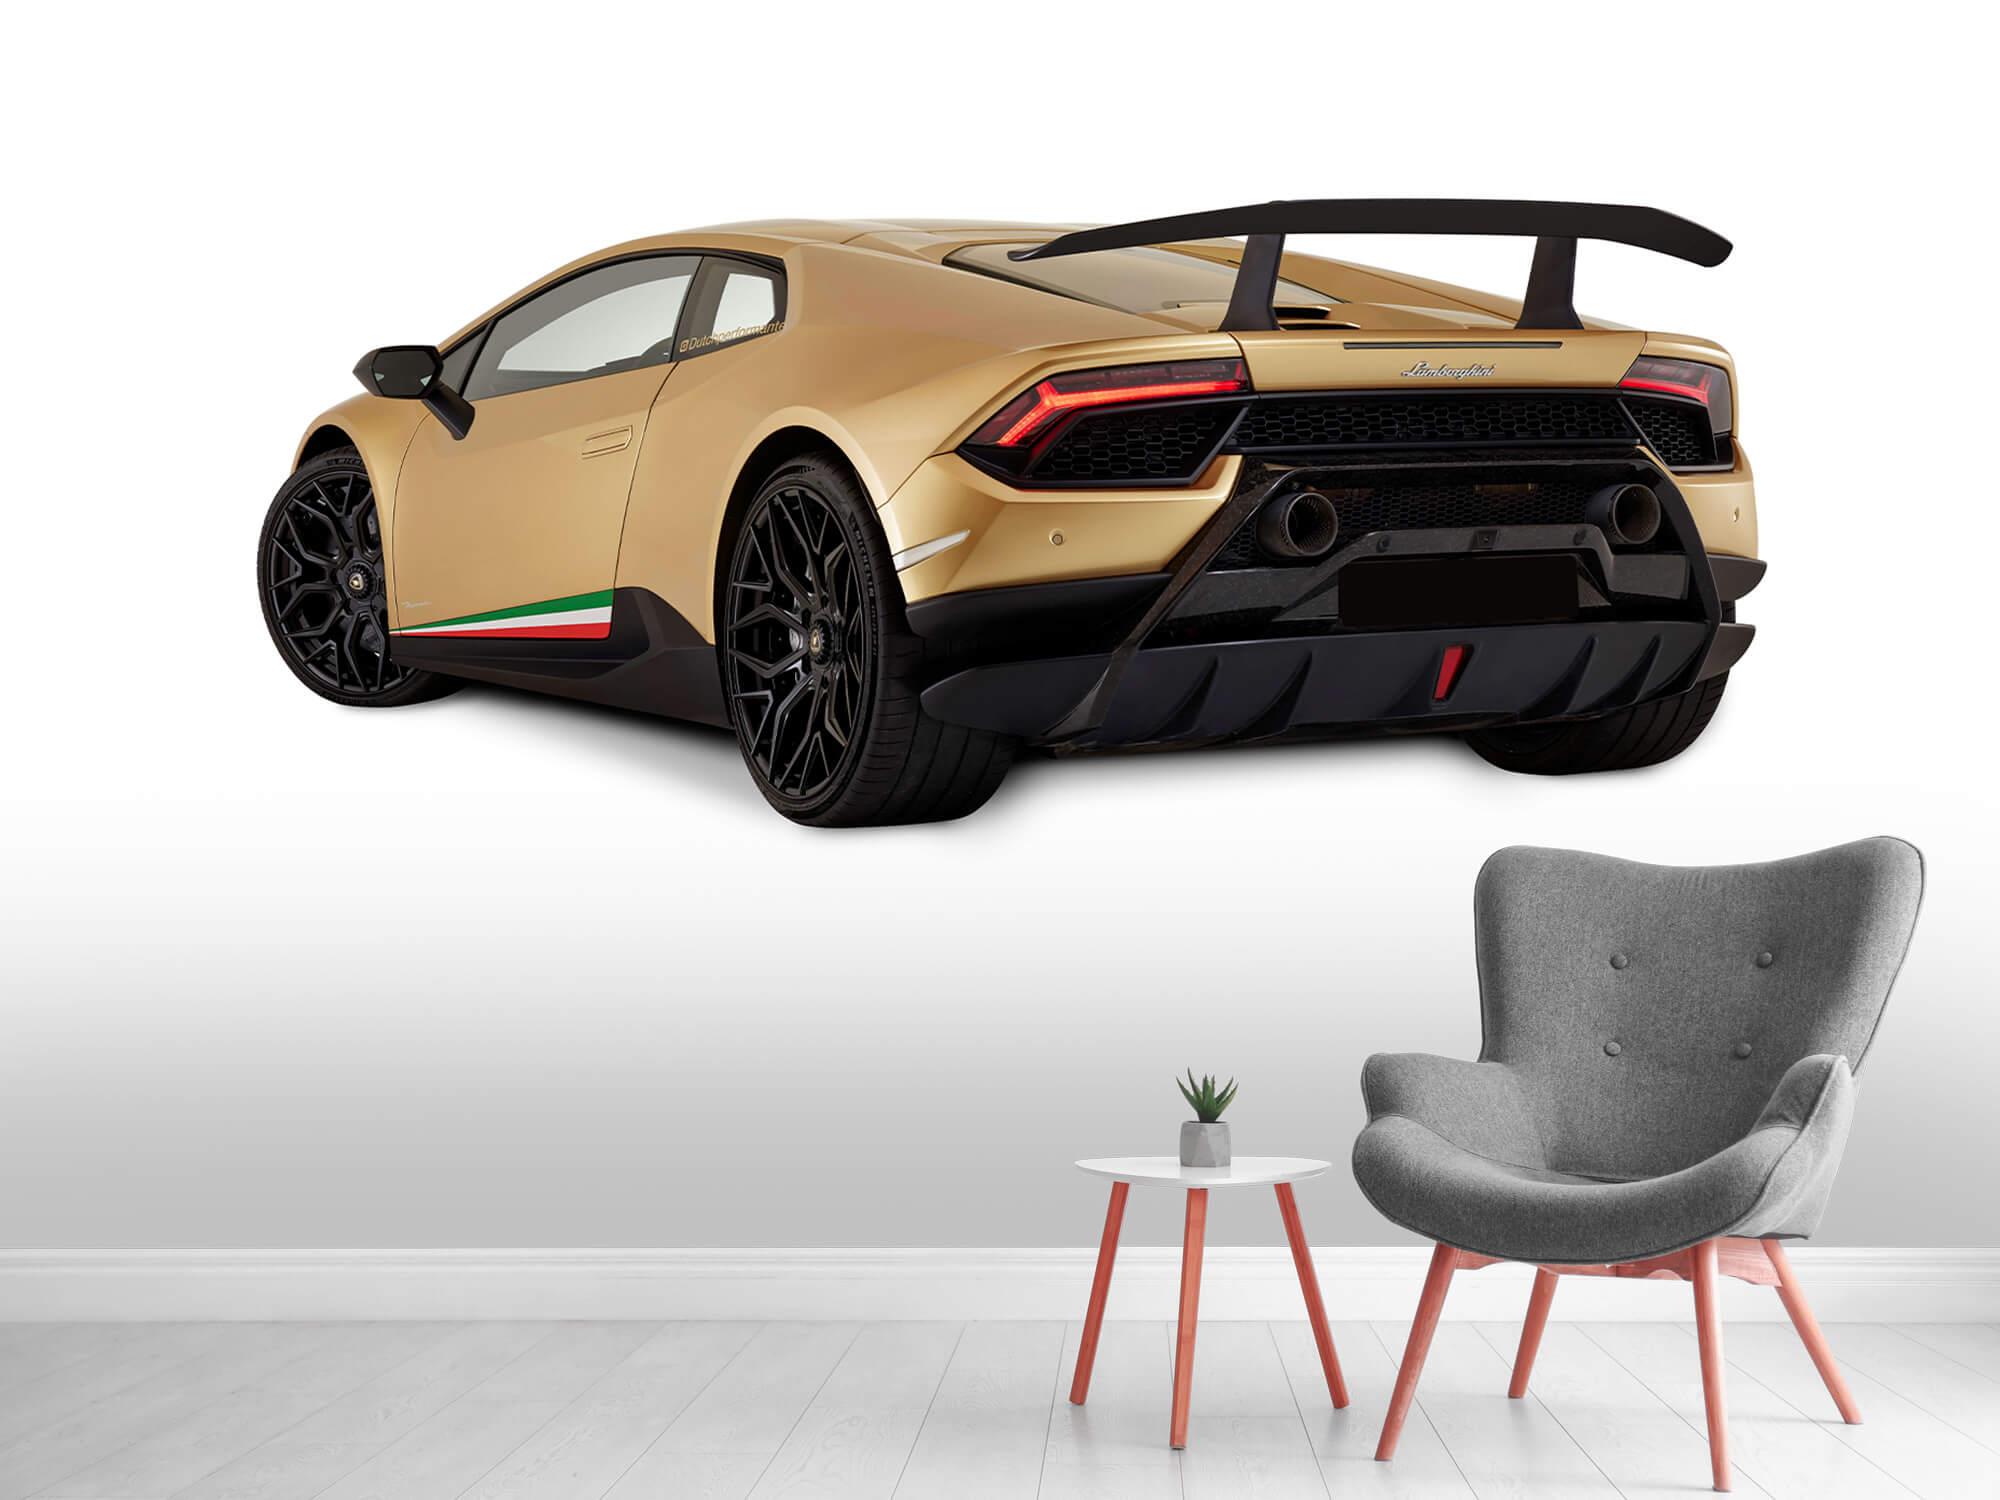 Wallpaper Lamborghini Huracán - Vänster bak, vit 4